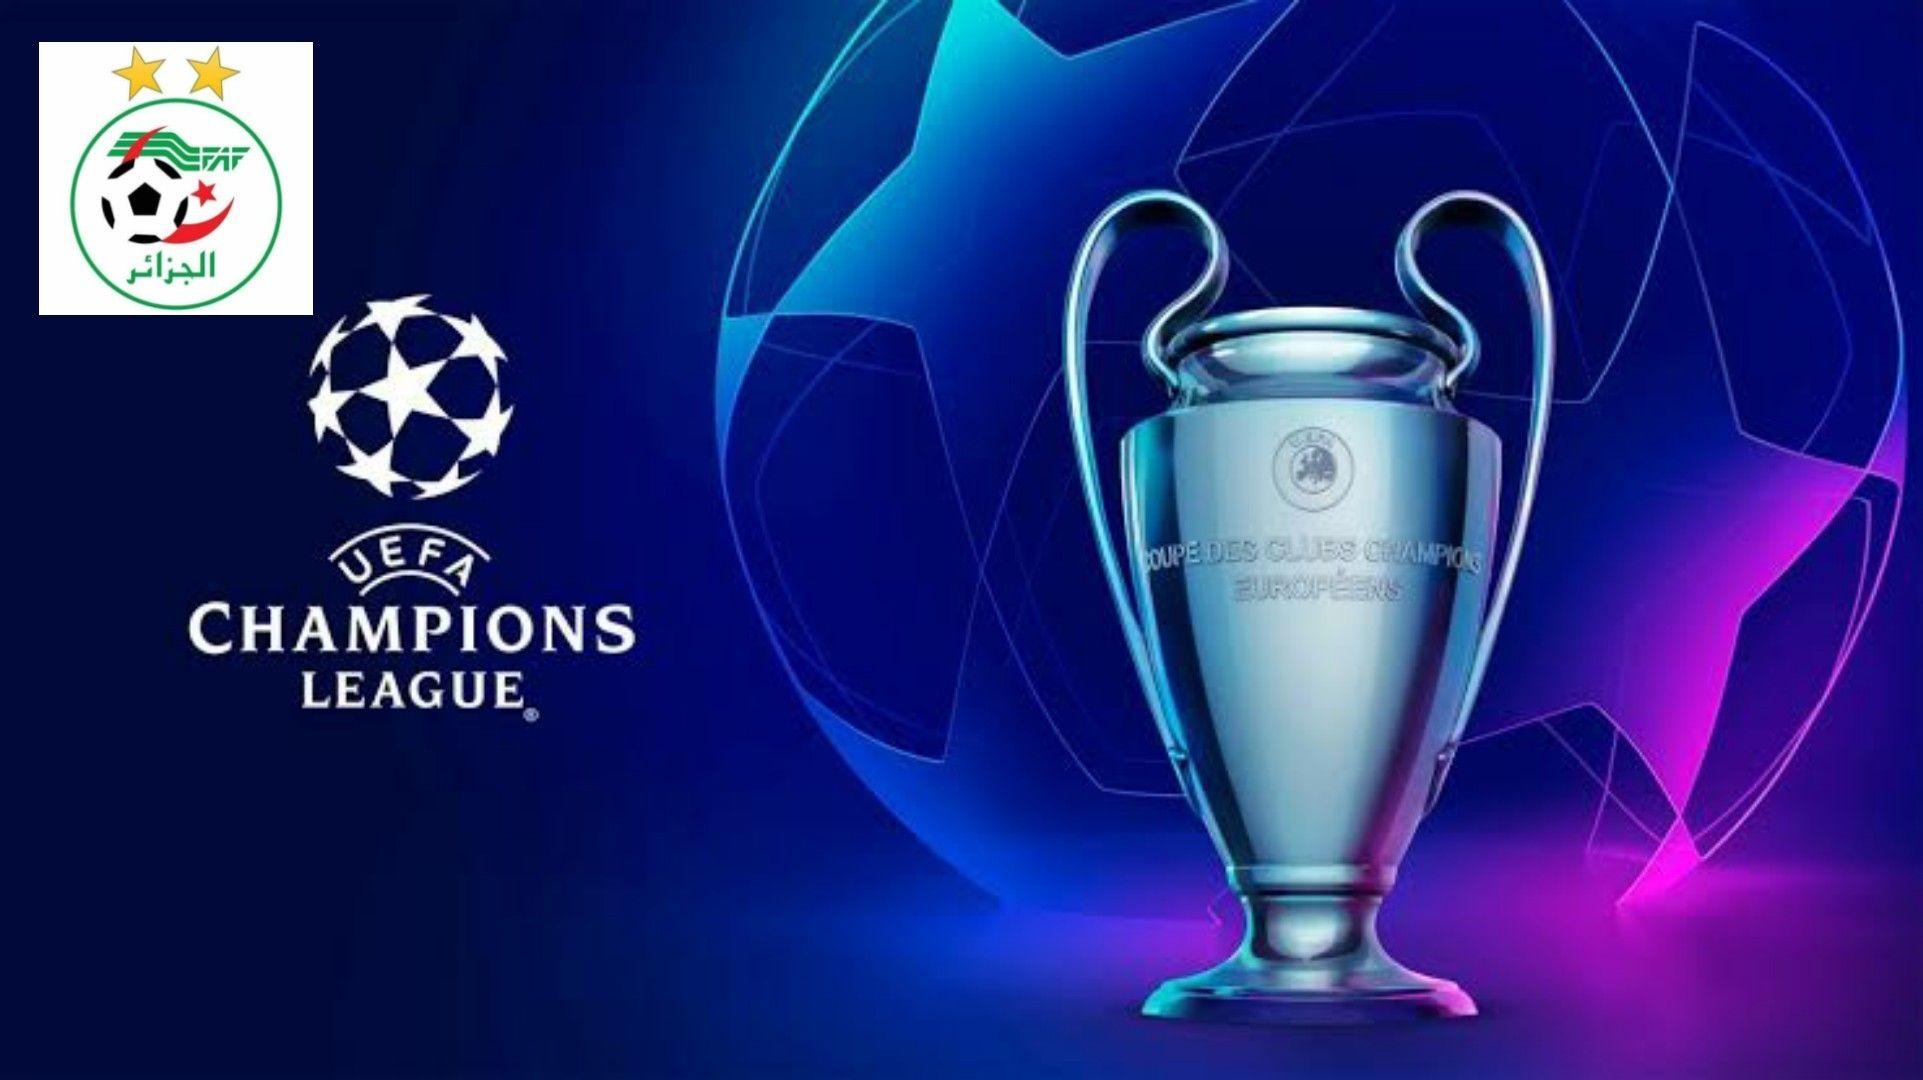 Pin by Sport Dz on الدوري الفرنسي in 2020 Champions